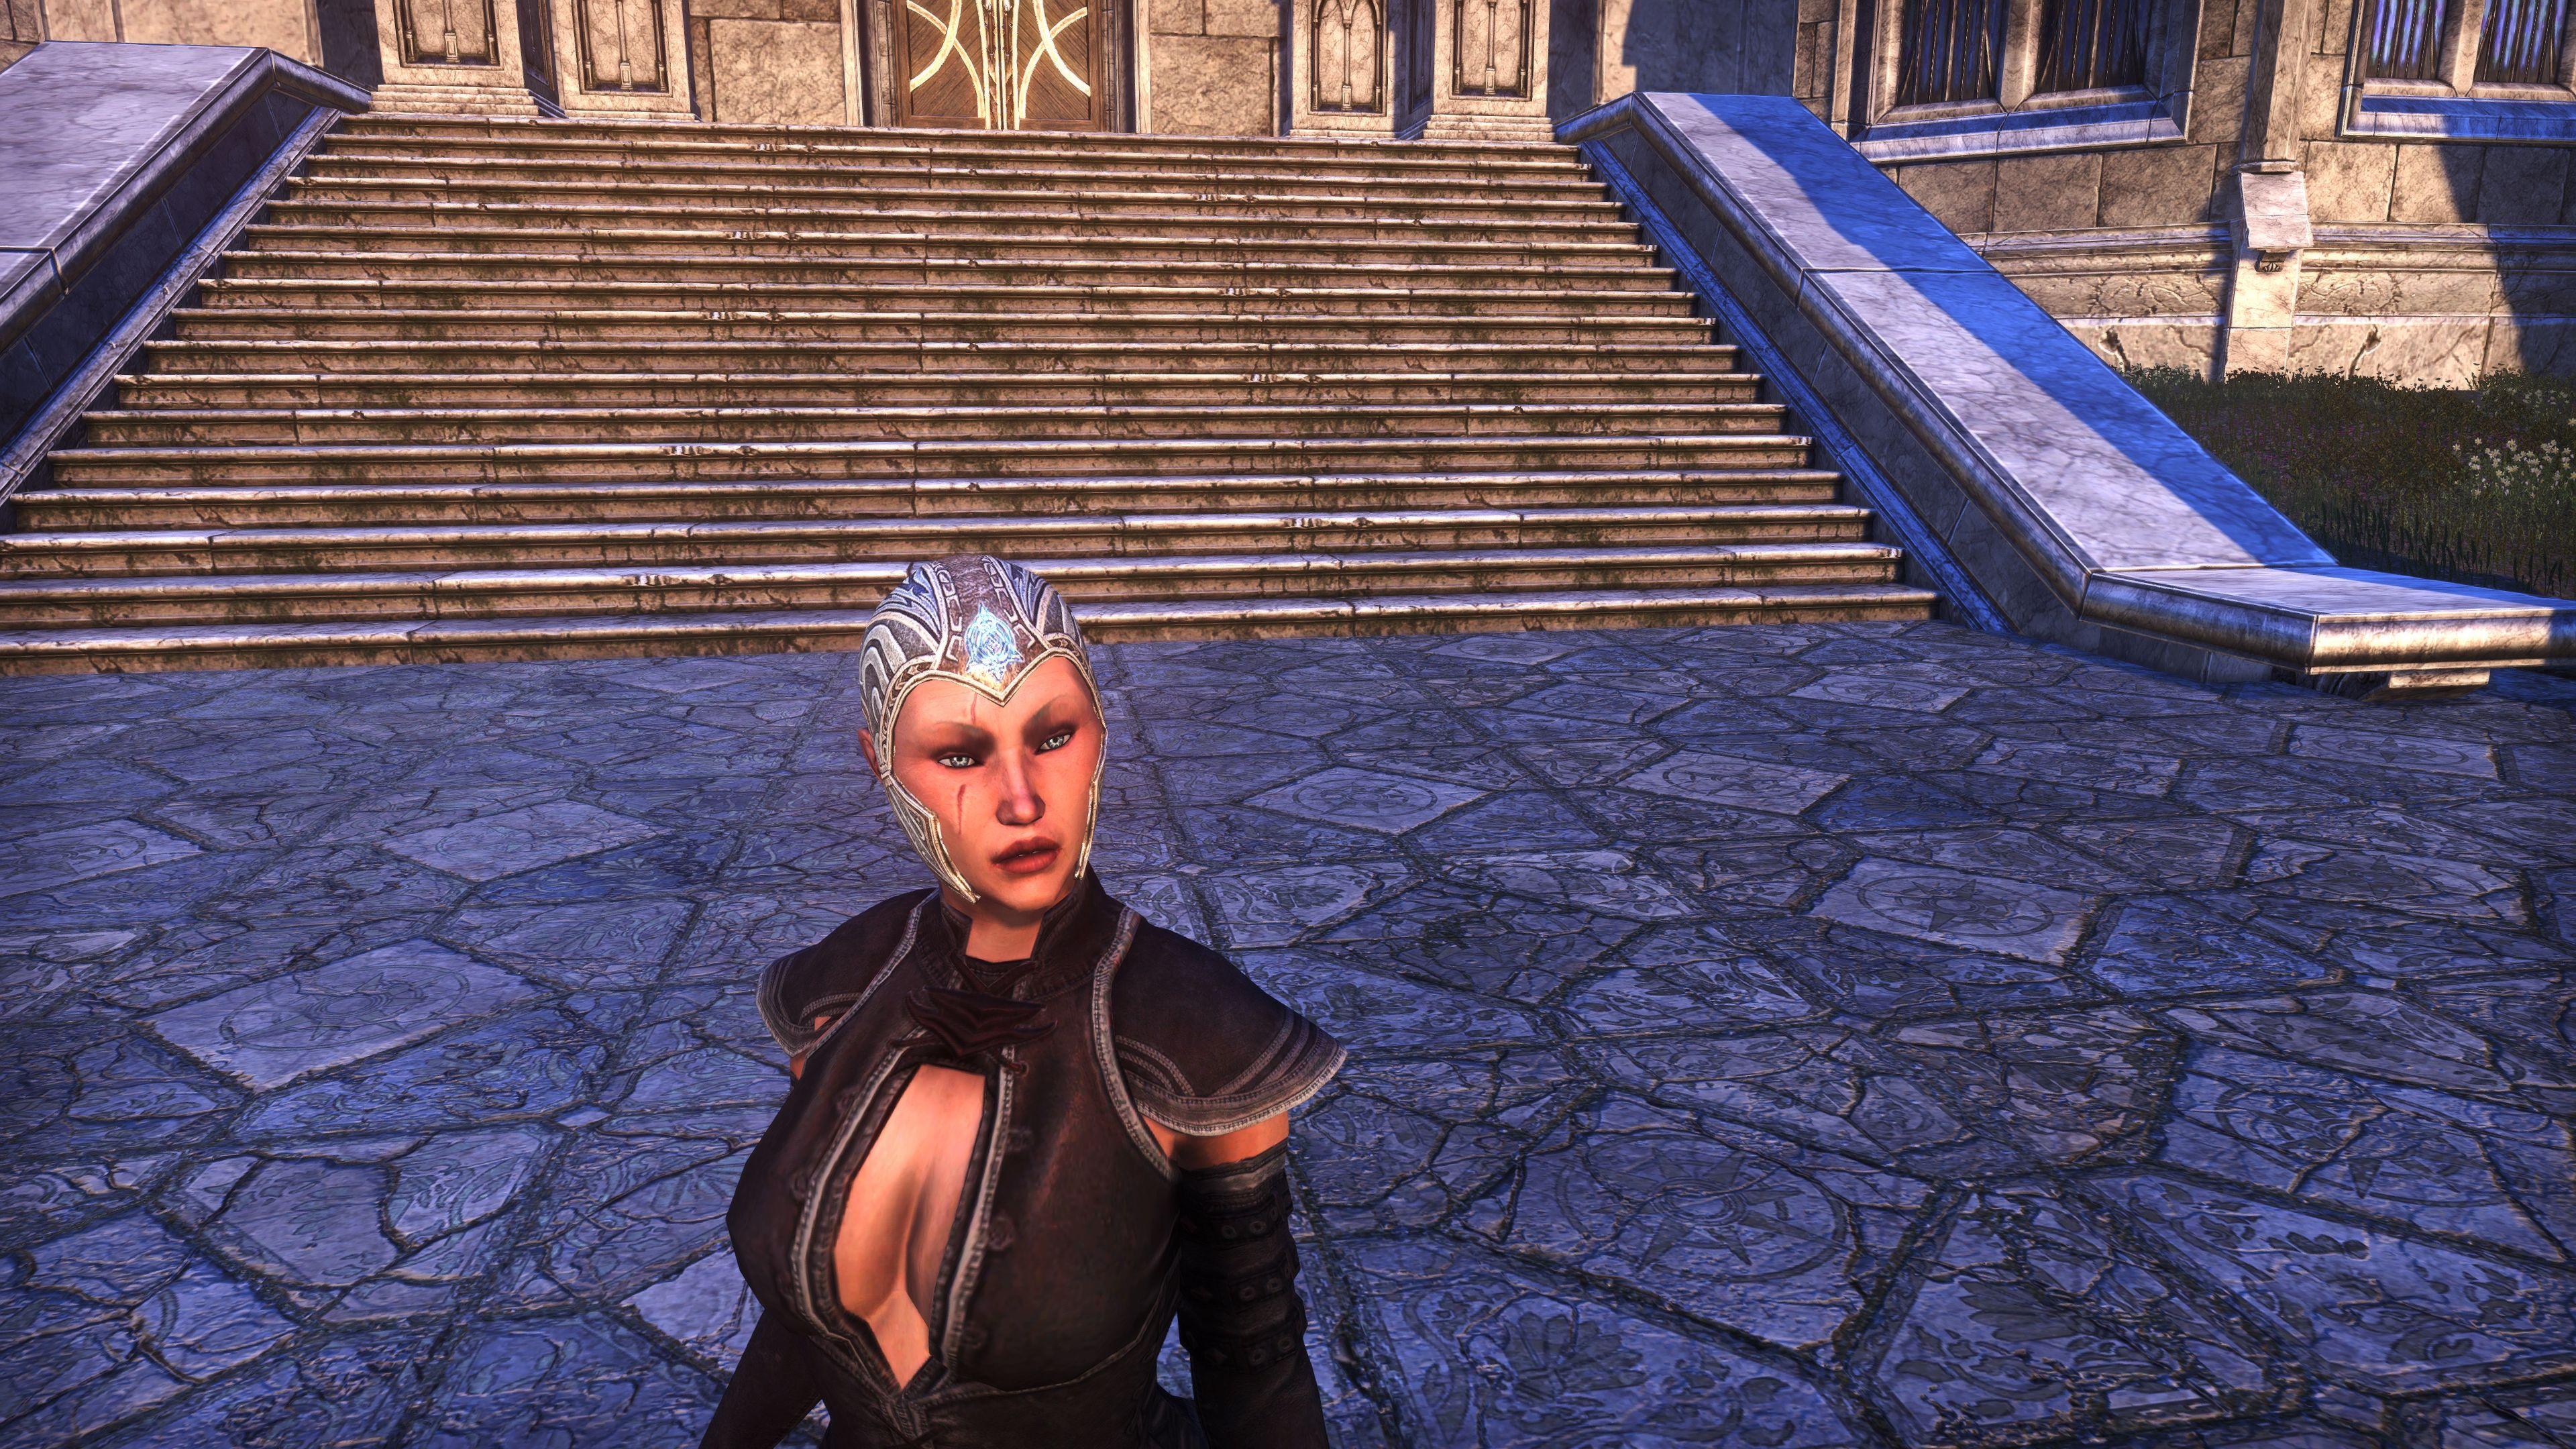 Muttonchop Skullcap (Appearance > Hats), Psijic Vault Crate, The Elder Scrolls Online